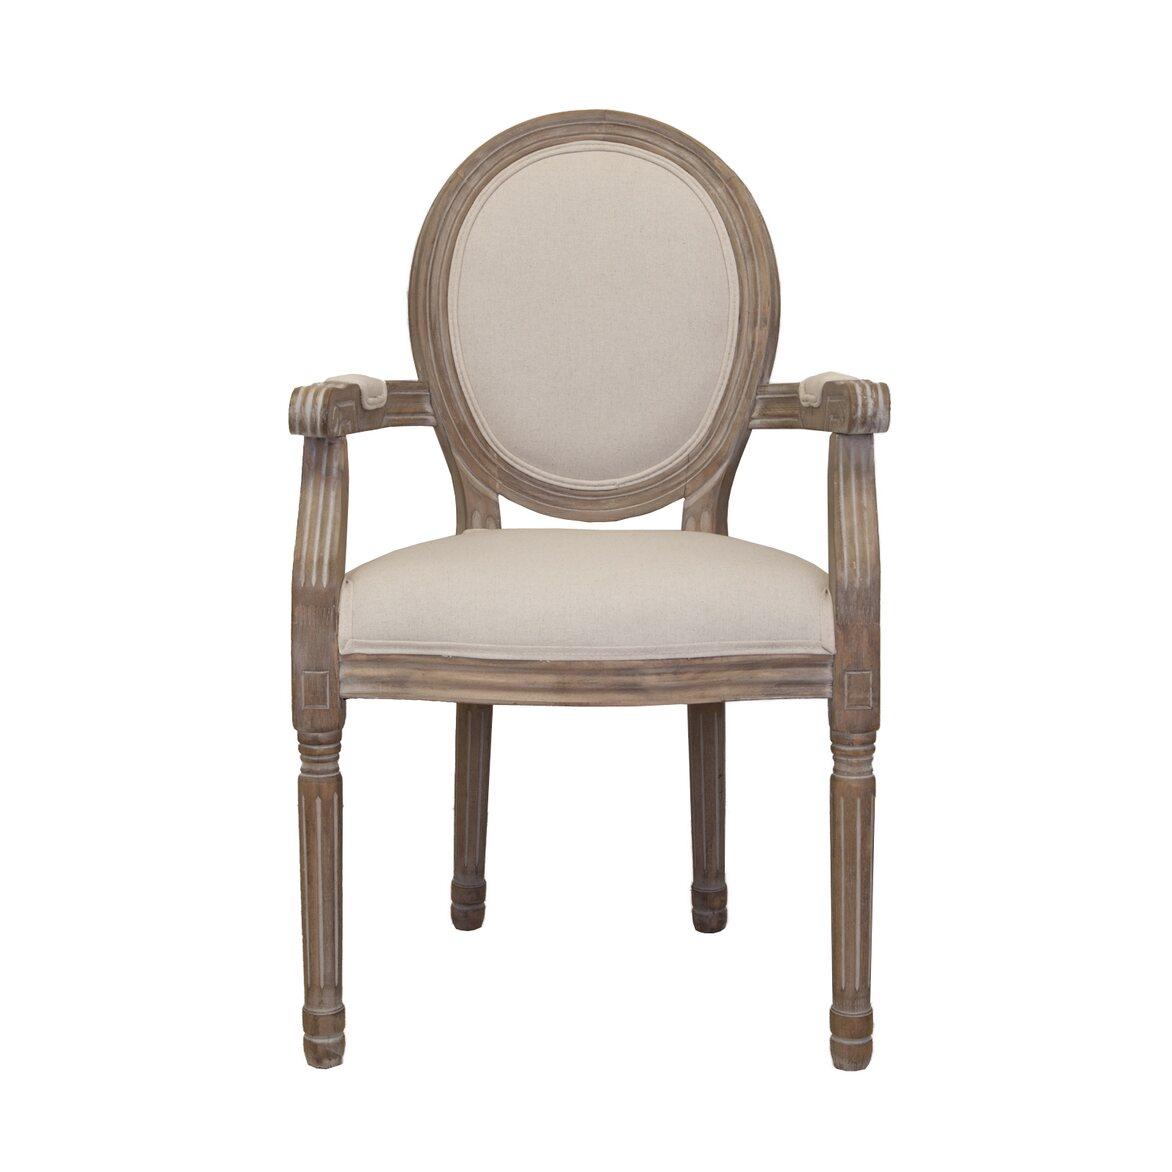 Стул Volker arm beige | Обеденные стулья Kingsby